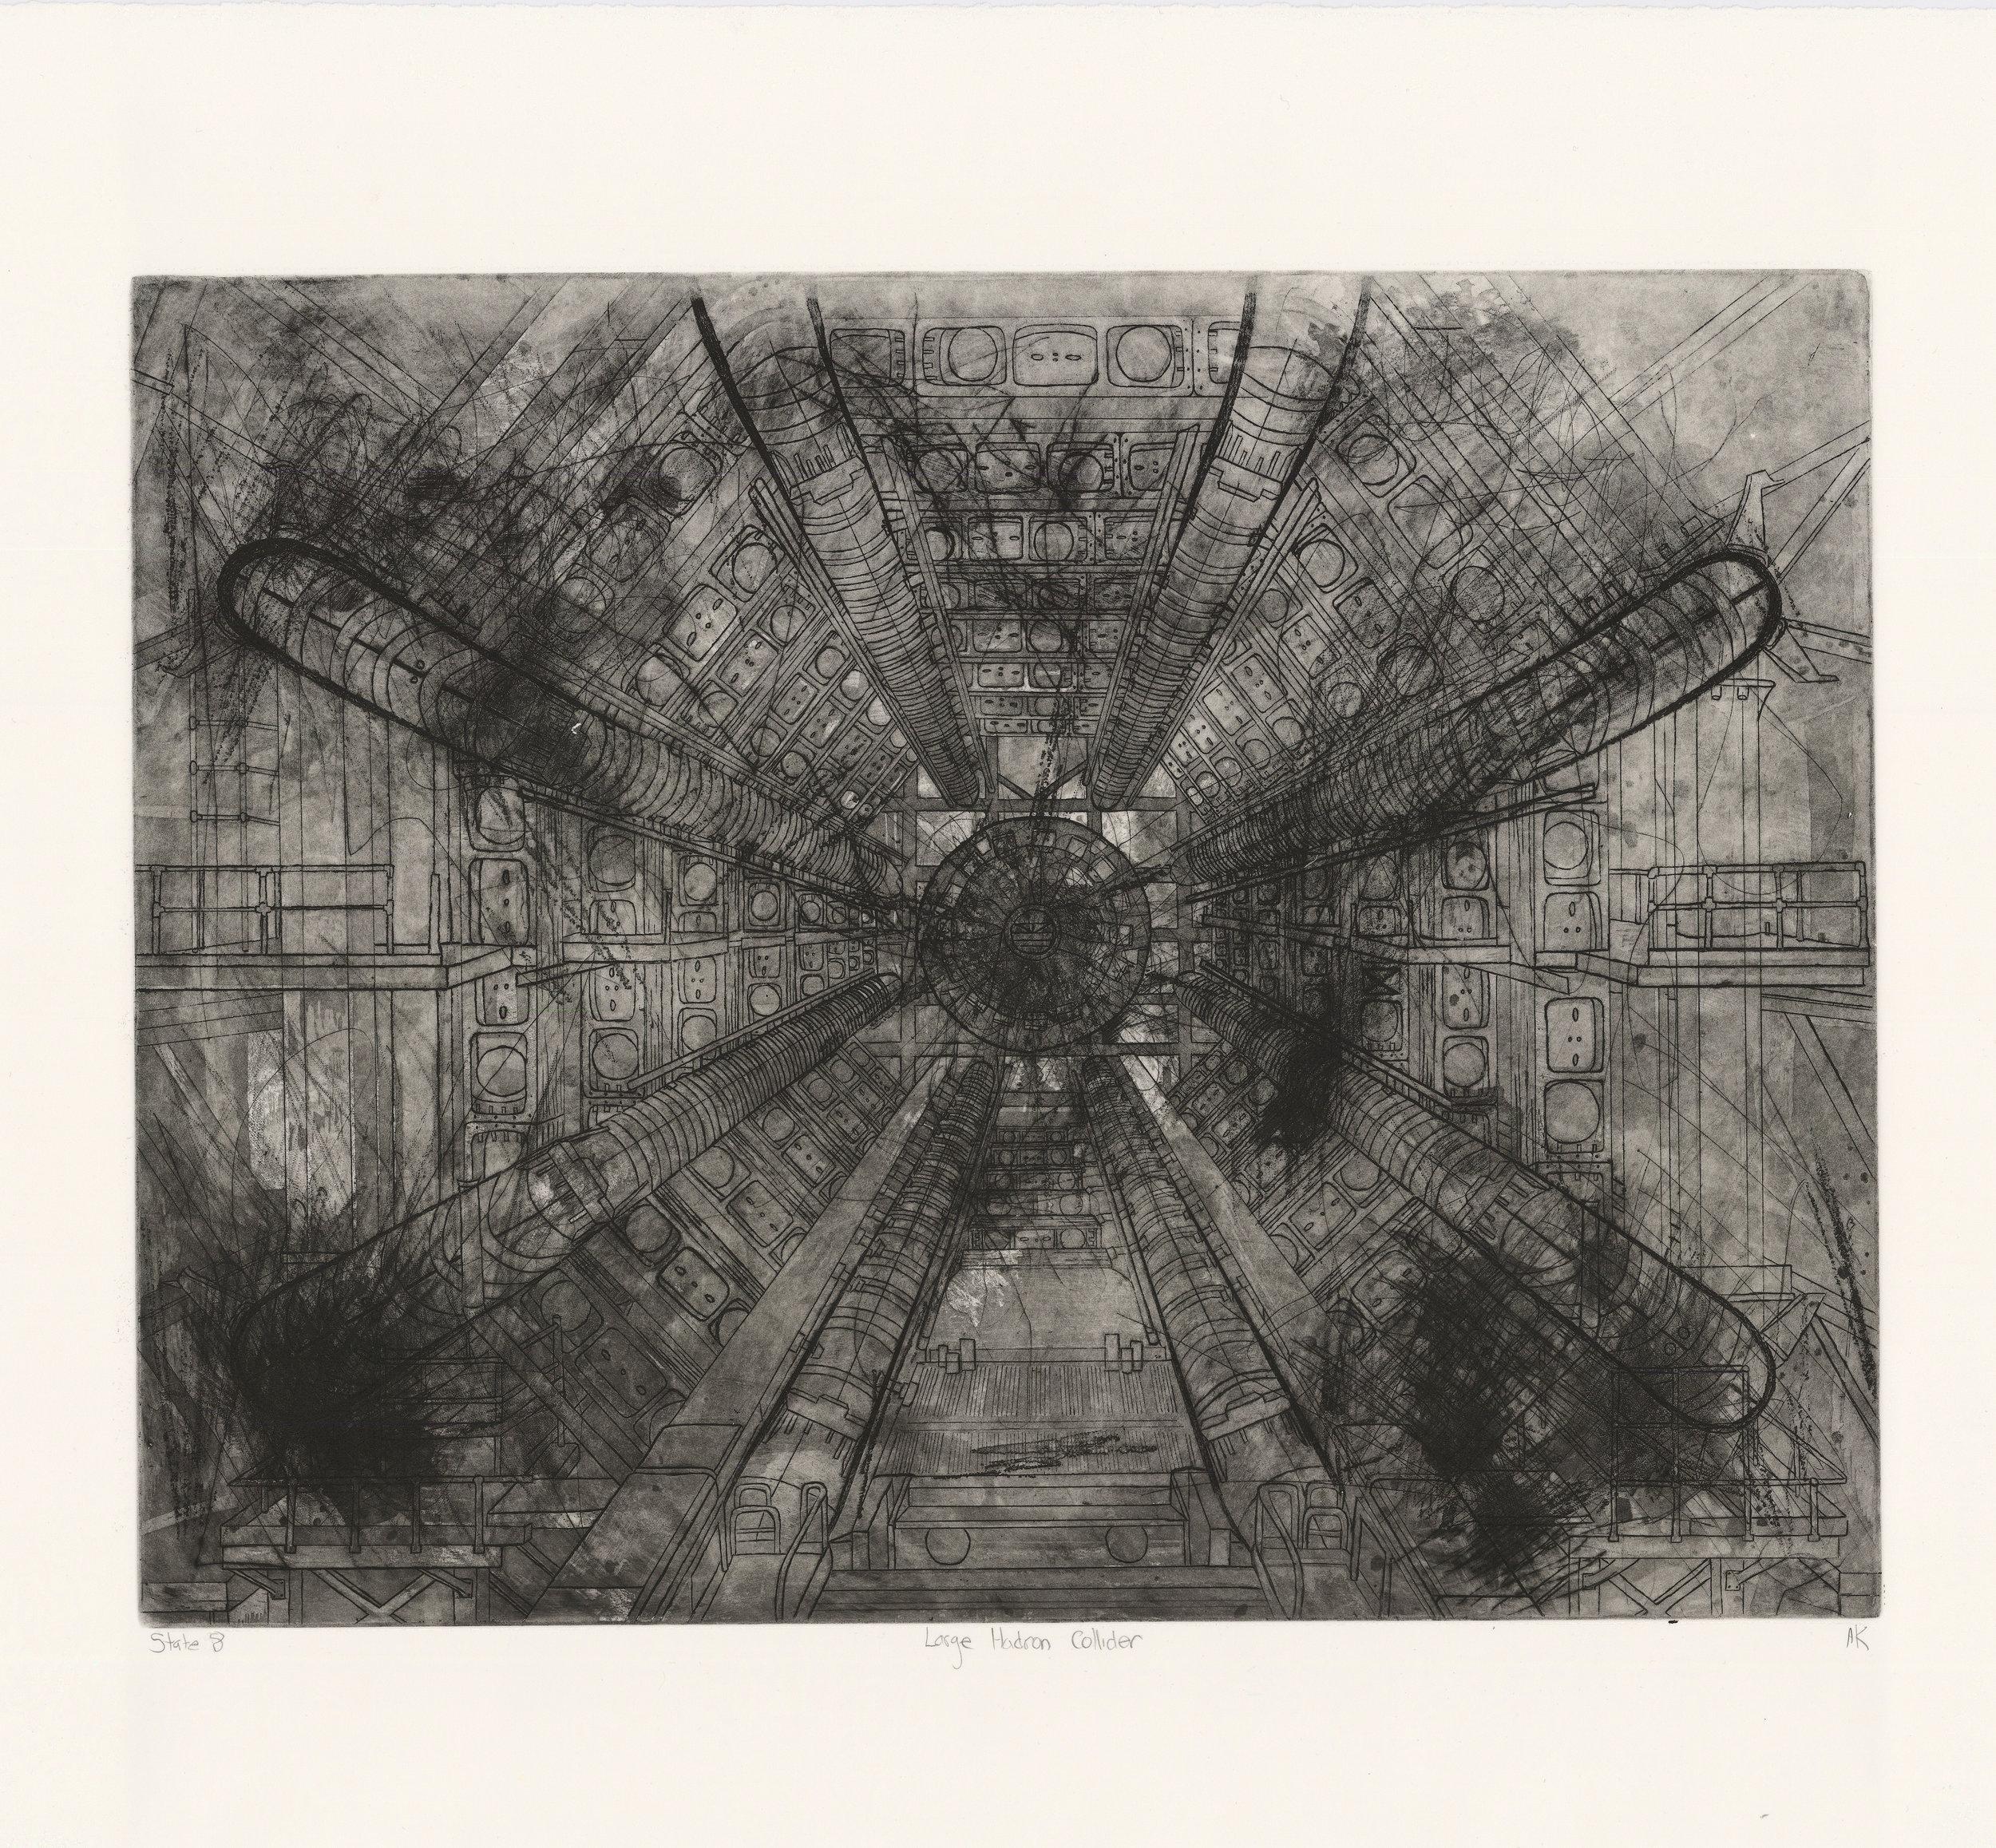 LHC, State 8